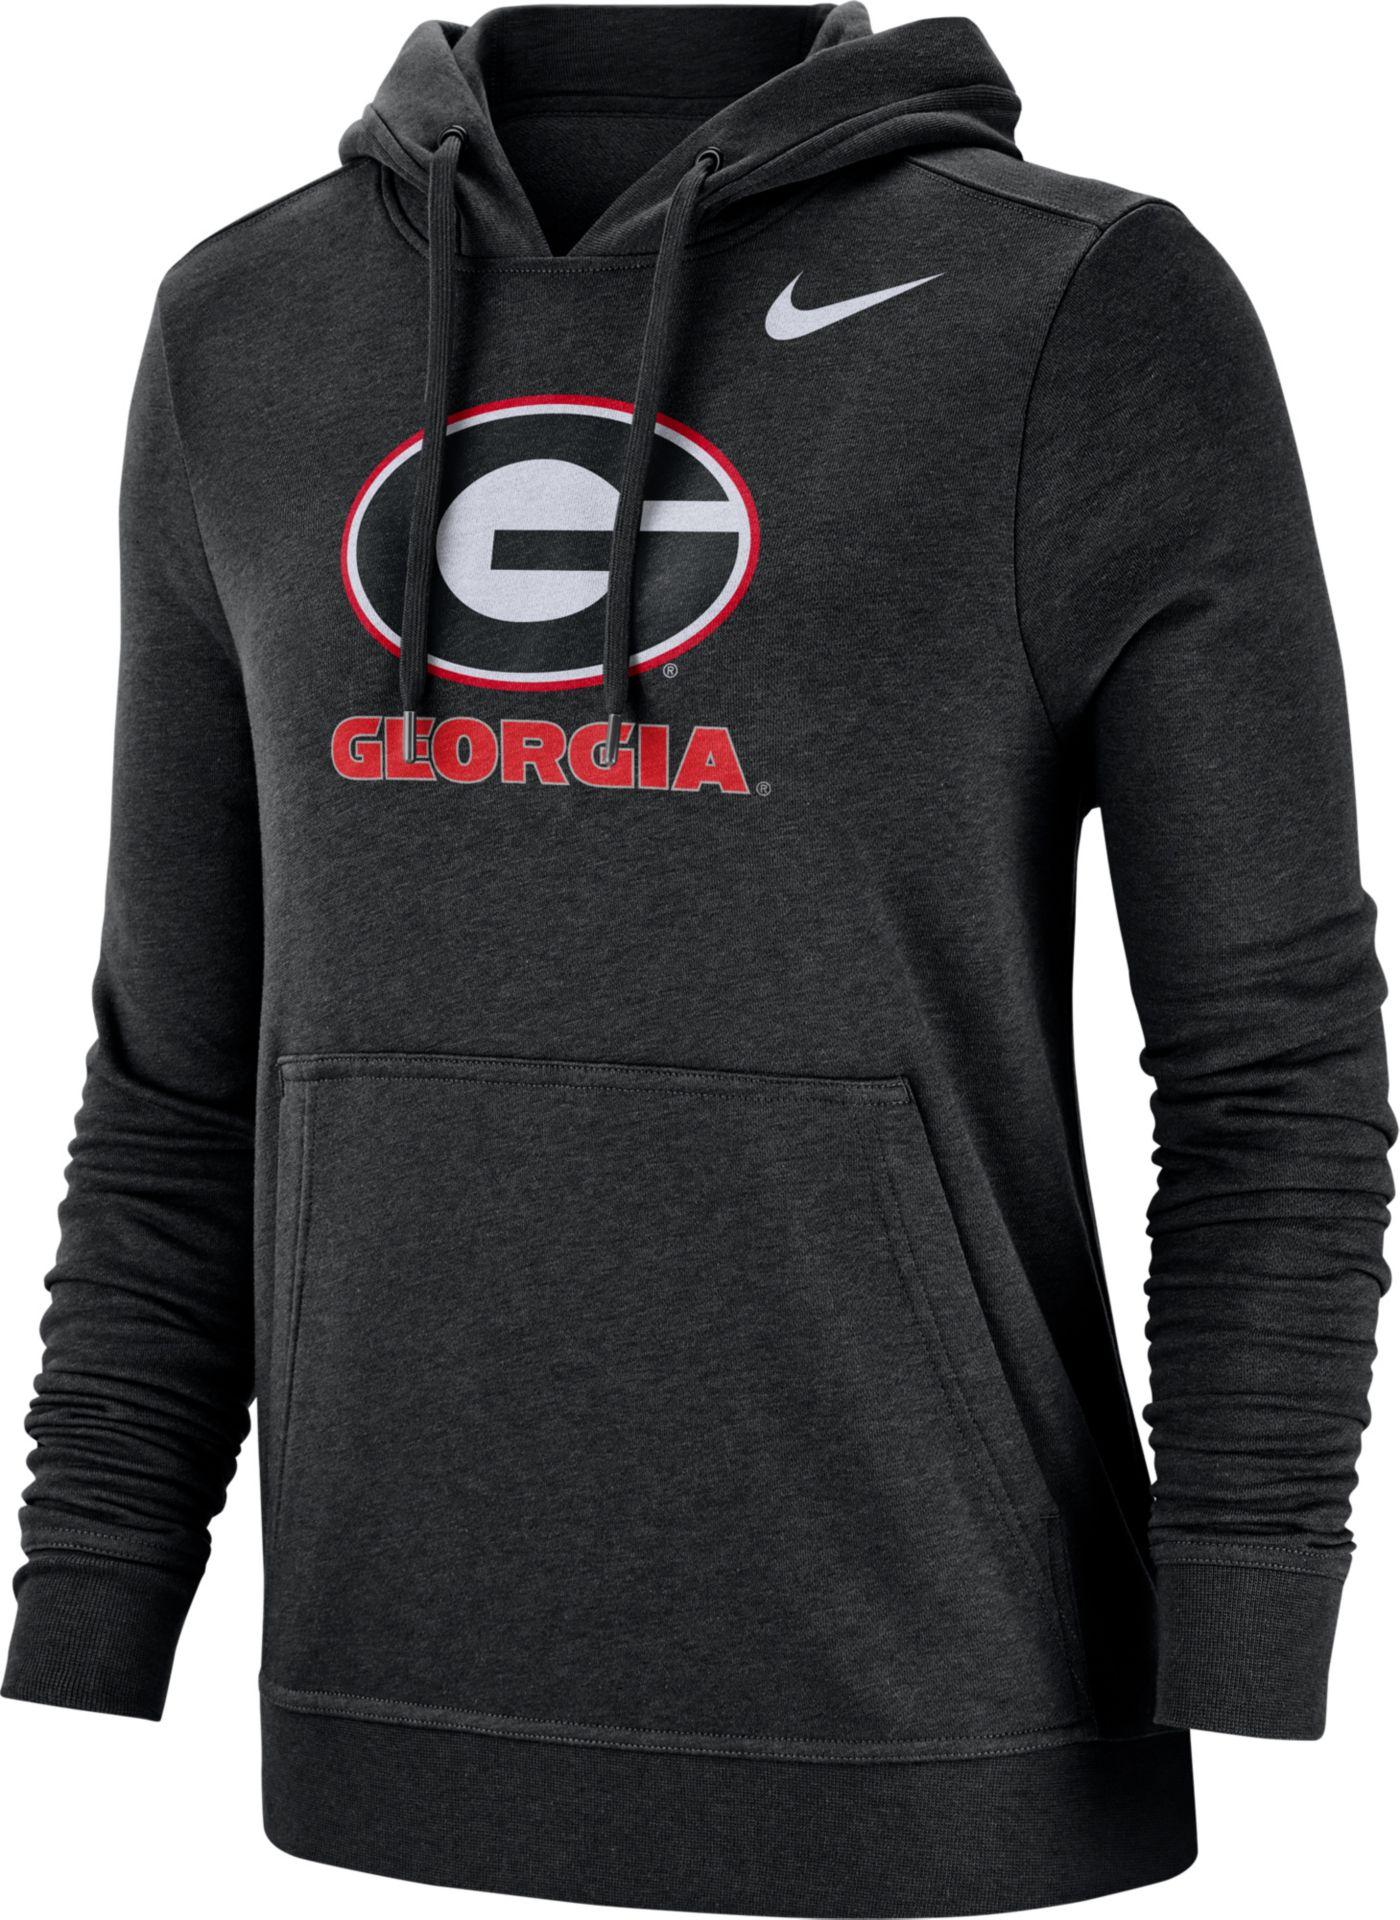 Nike Women's Georgia Bulldogs Club Fleece Pullover Black Hoodie